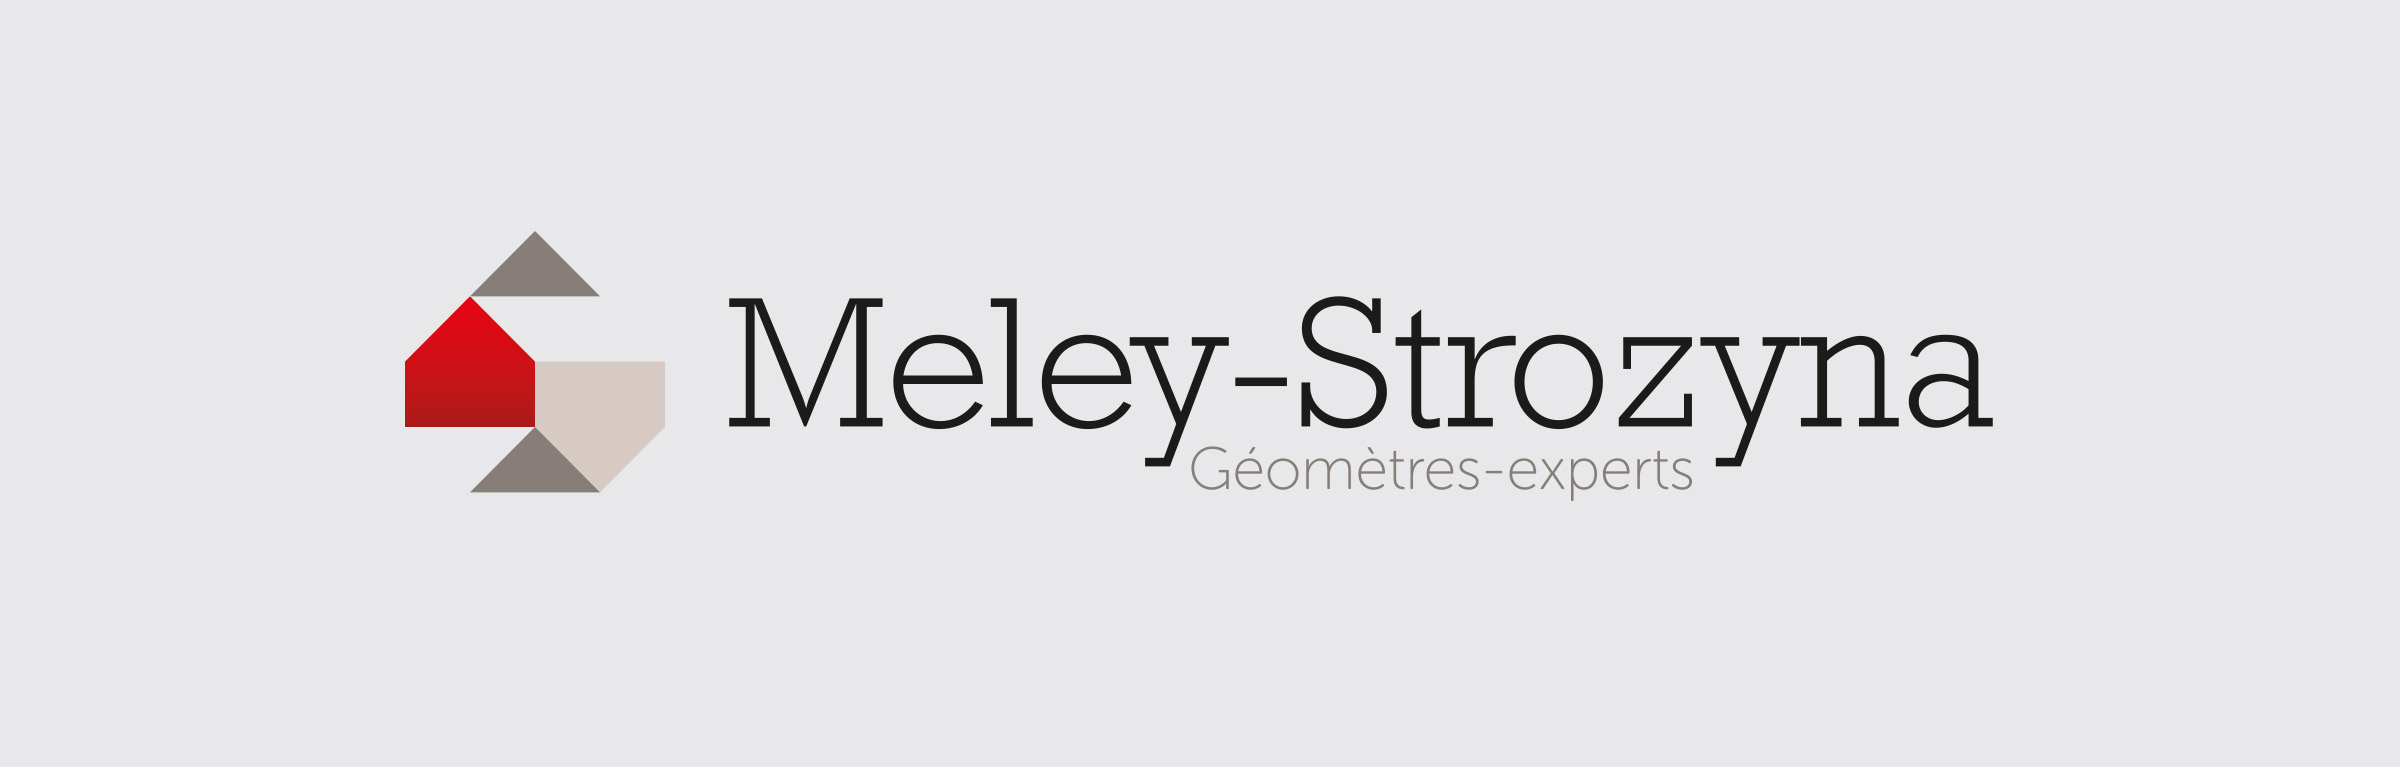 Création logo - géomètres